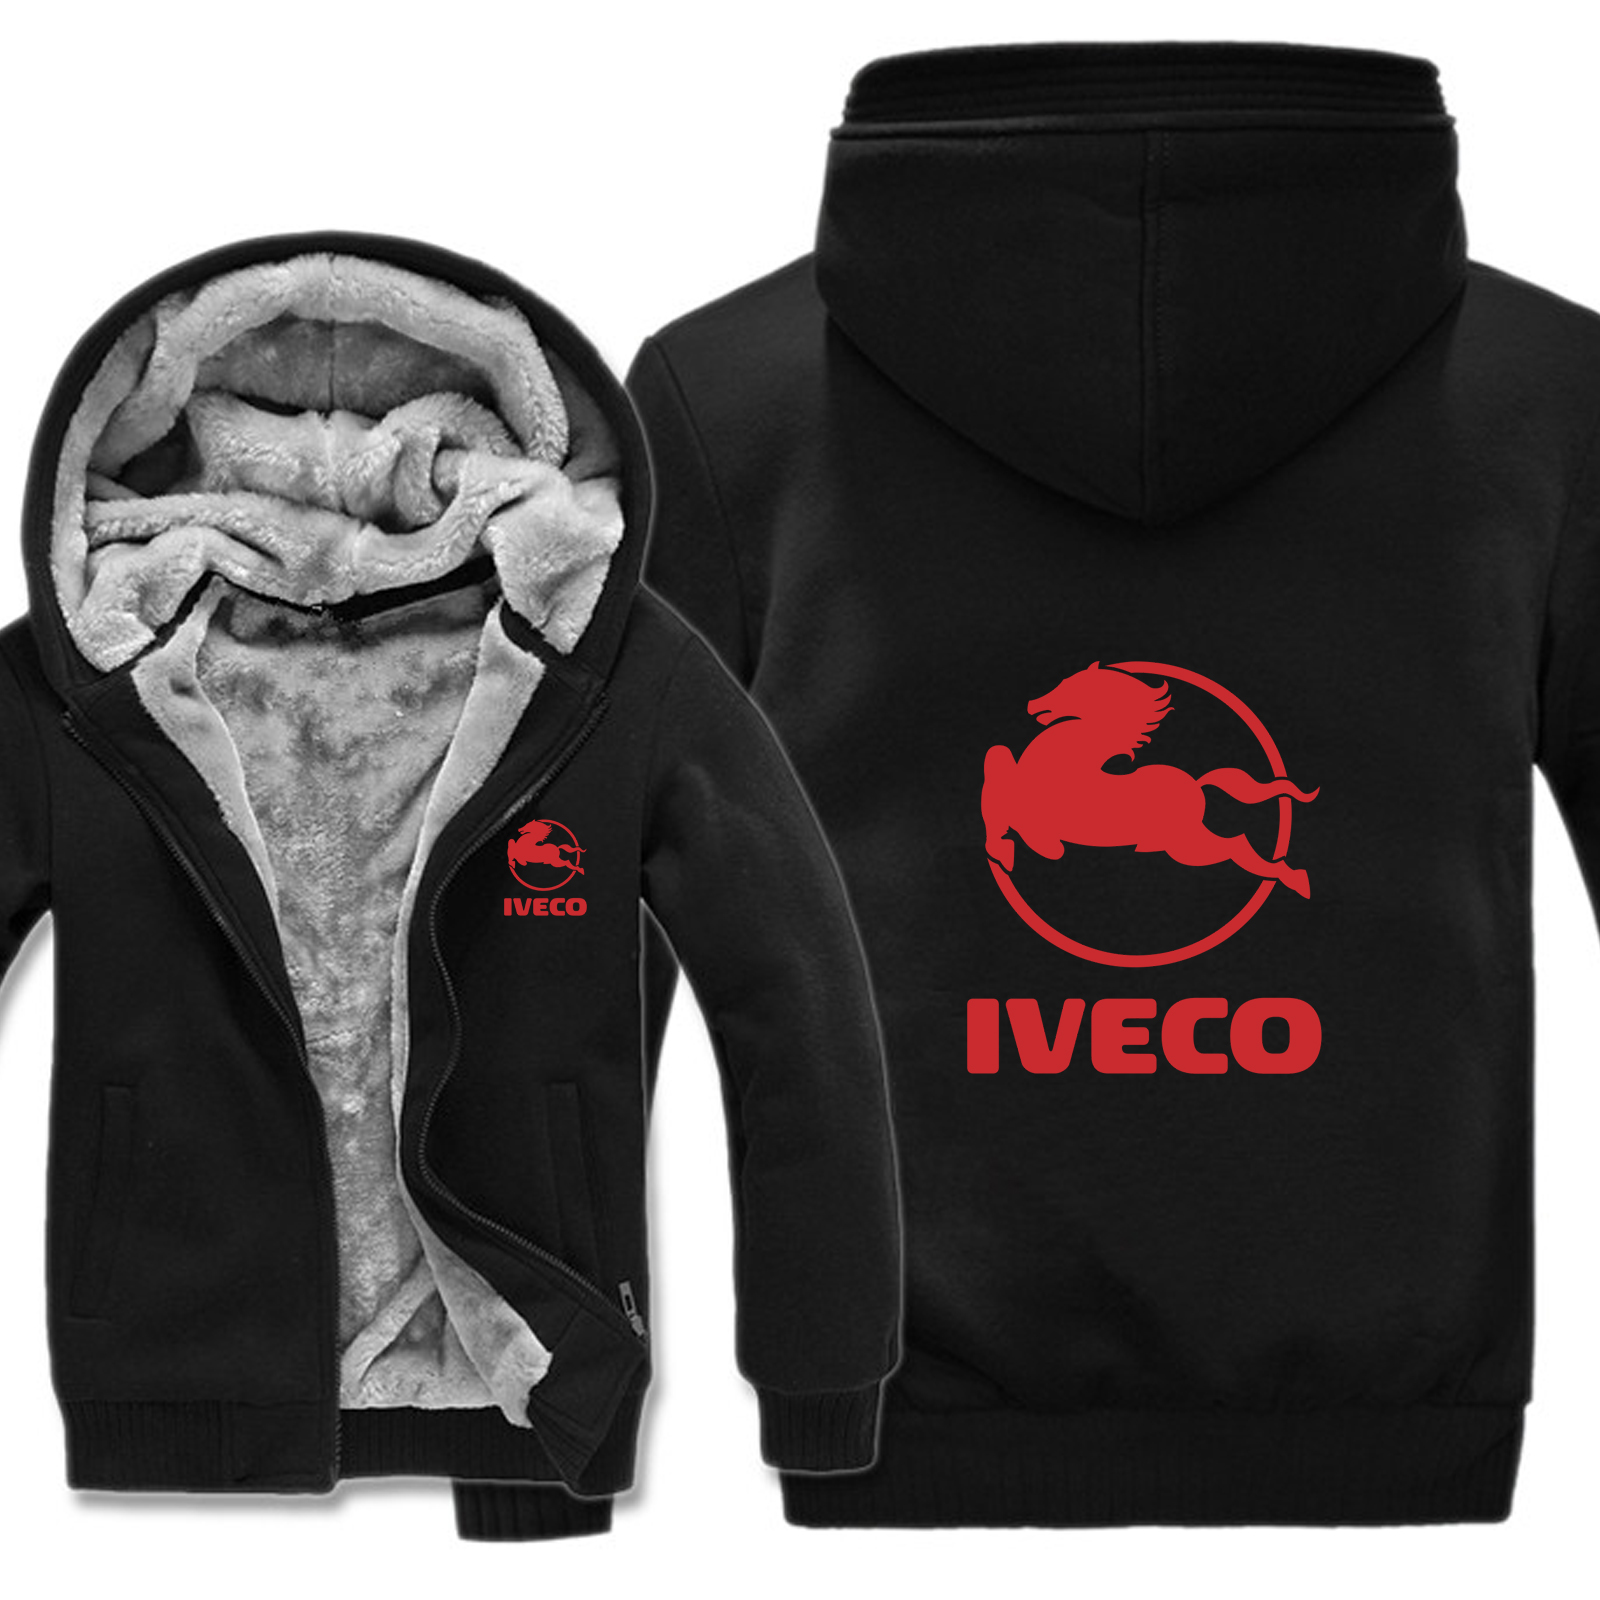 Image 3 - Winter Iveco Truck Hoodies Men Fashion Coat Pullover Wool Liner Jacket Iveco Sweatshirts Hoody HS 004-in Hoodies & Sweatshirts from Men's Clothing